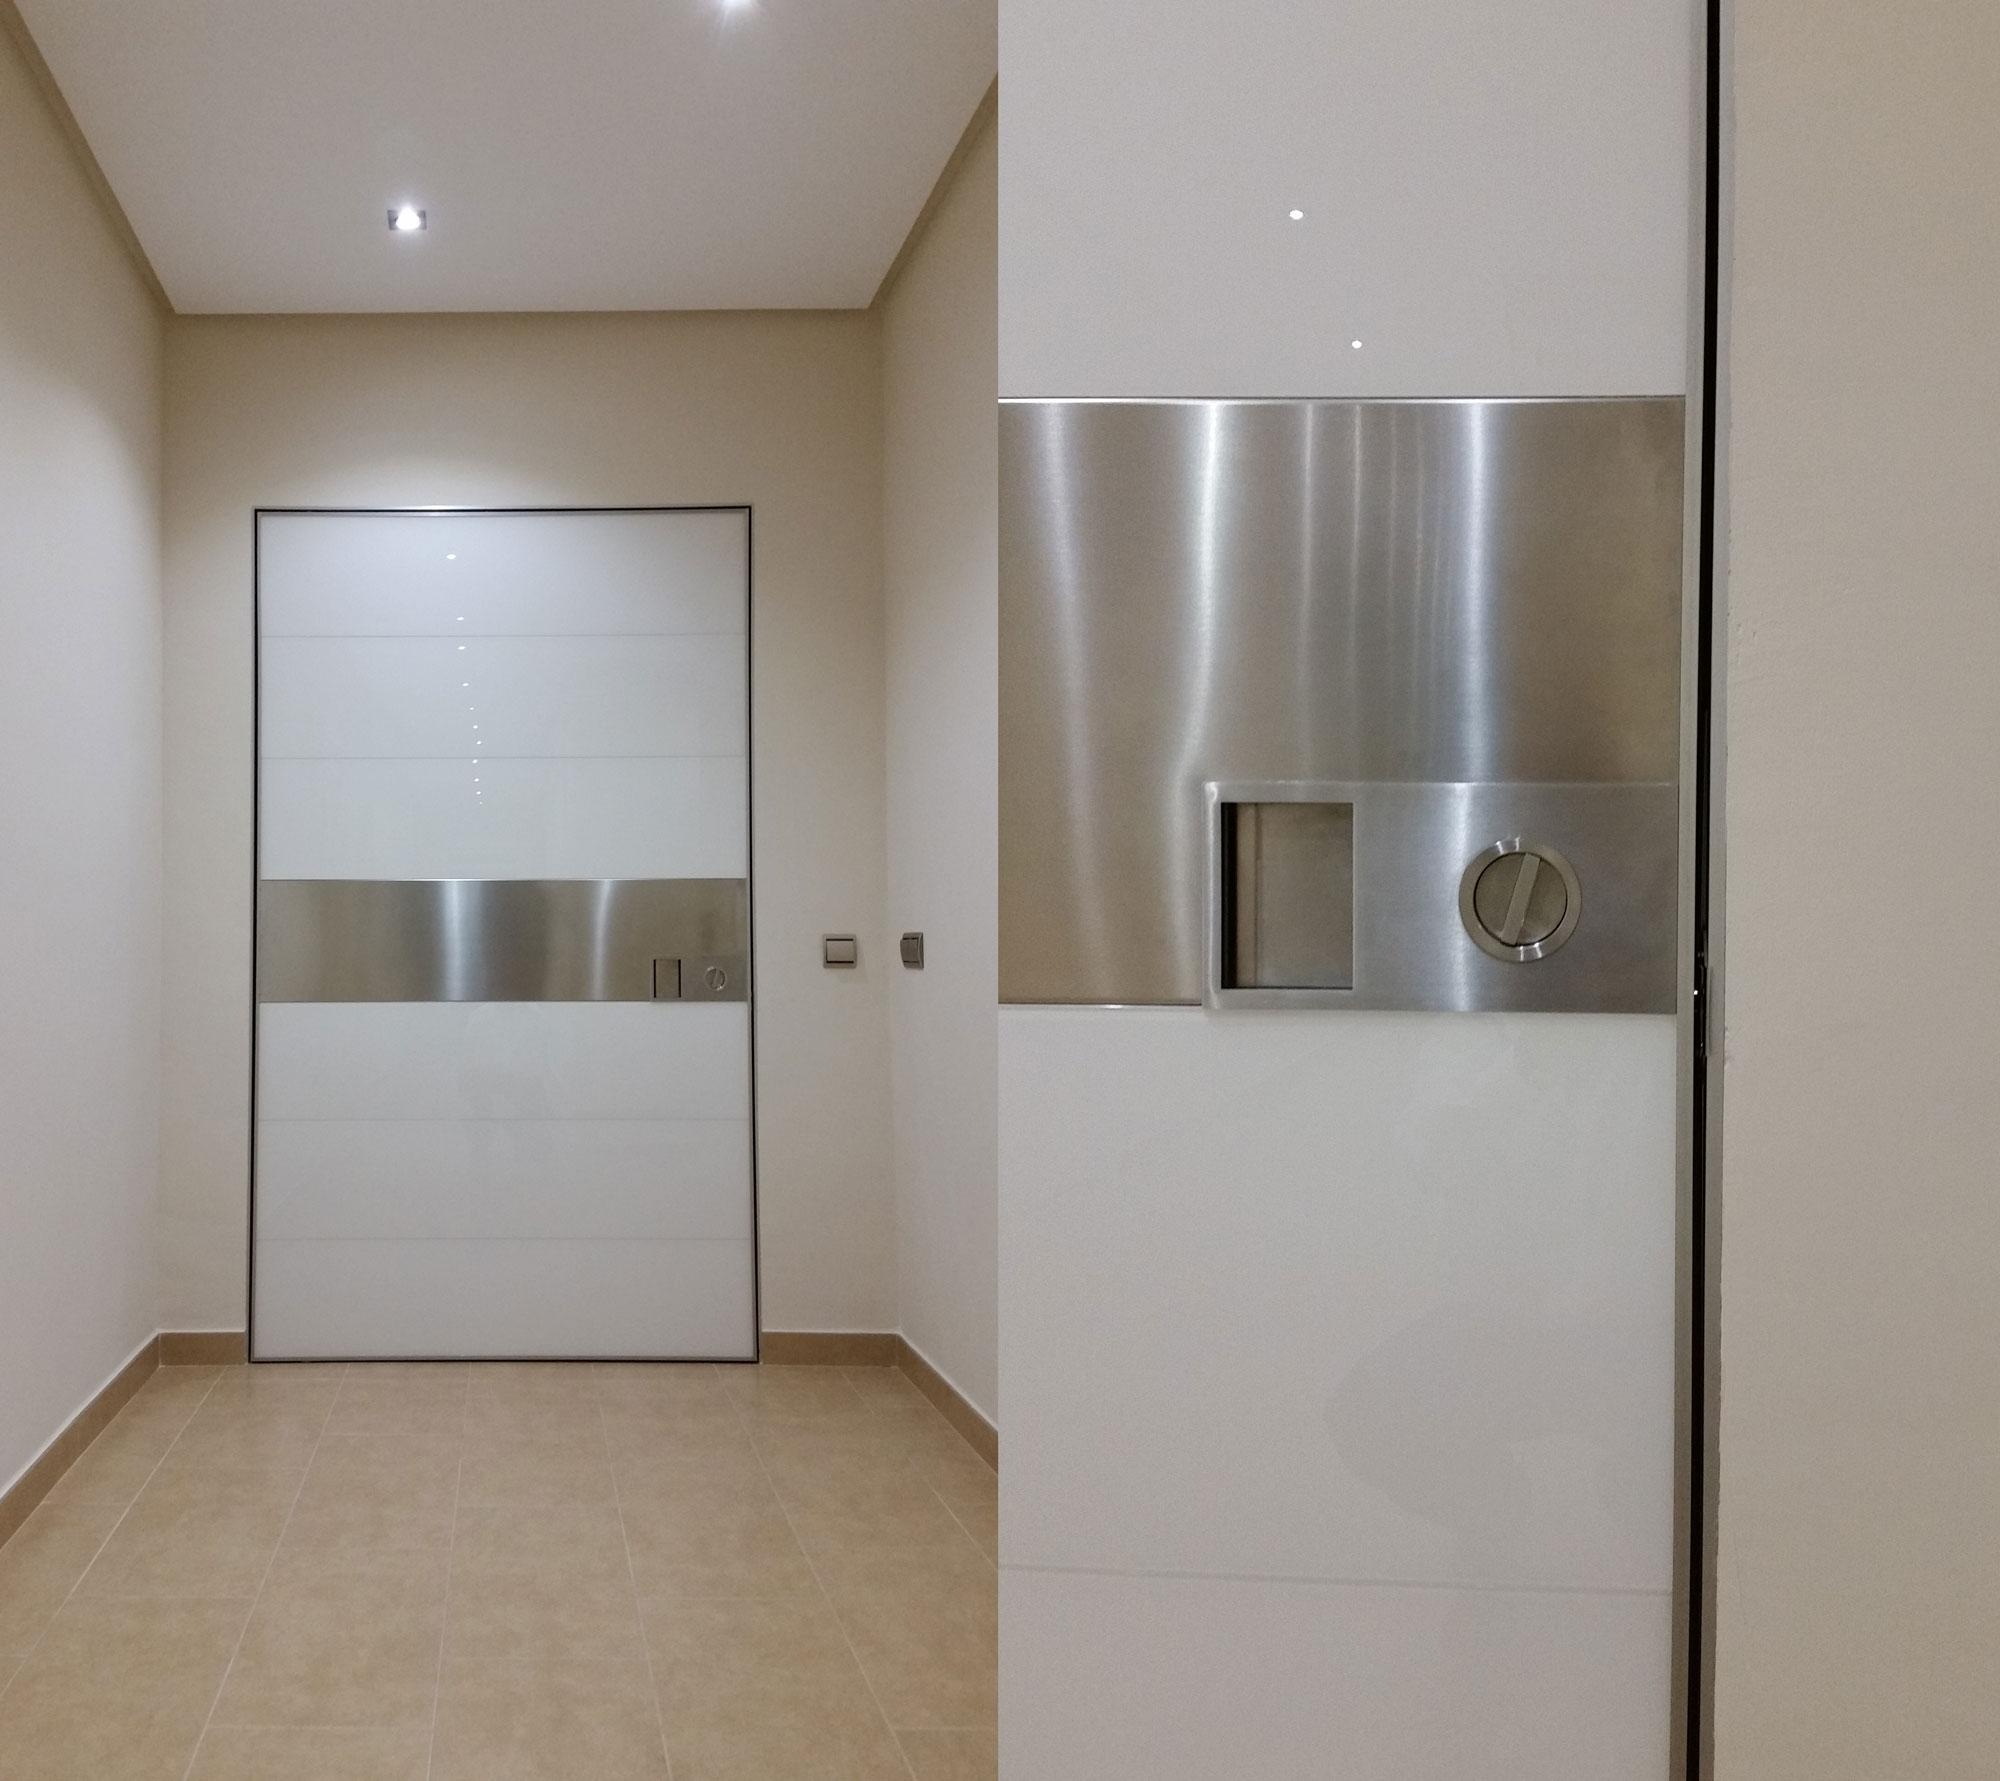 Timberplan obra residencial vivienda Ciudad Real 6 2000x1781 c